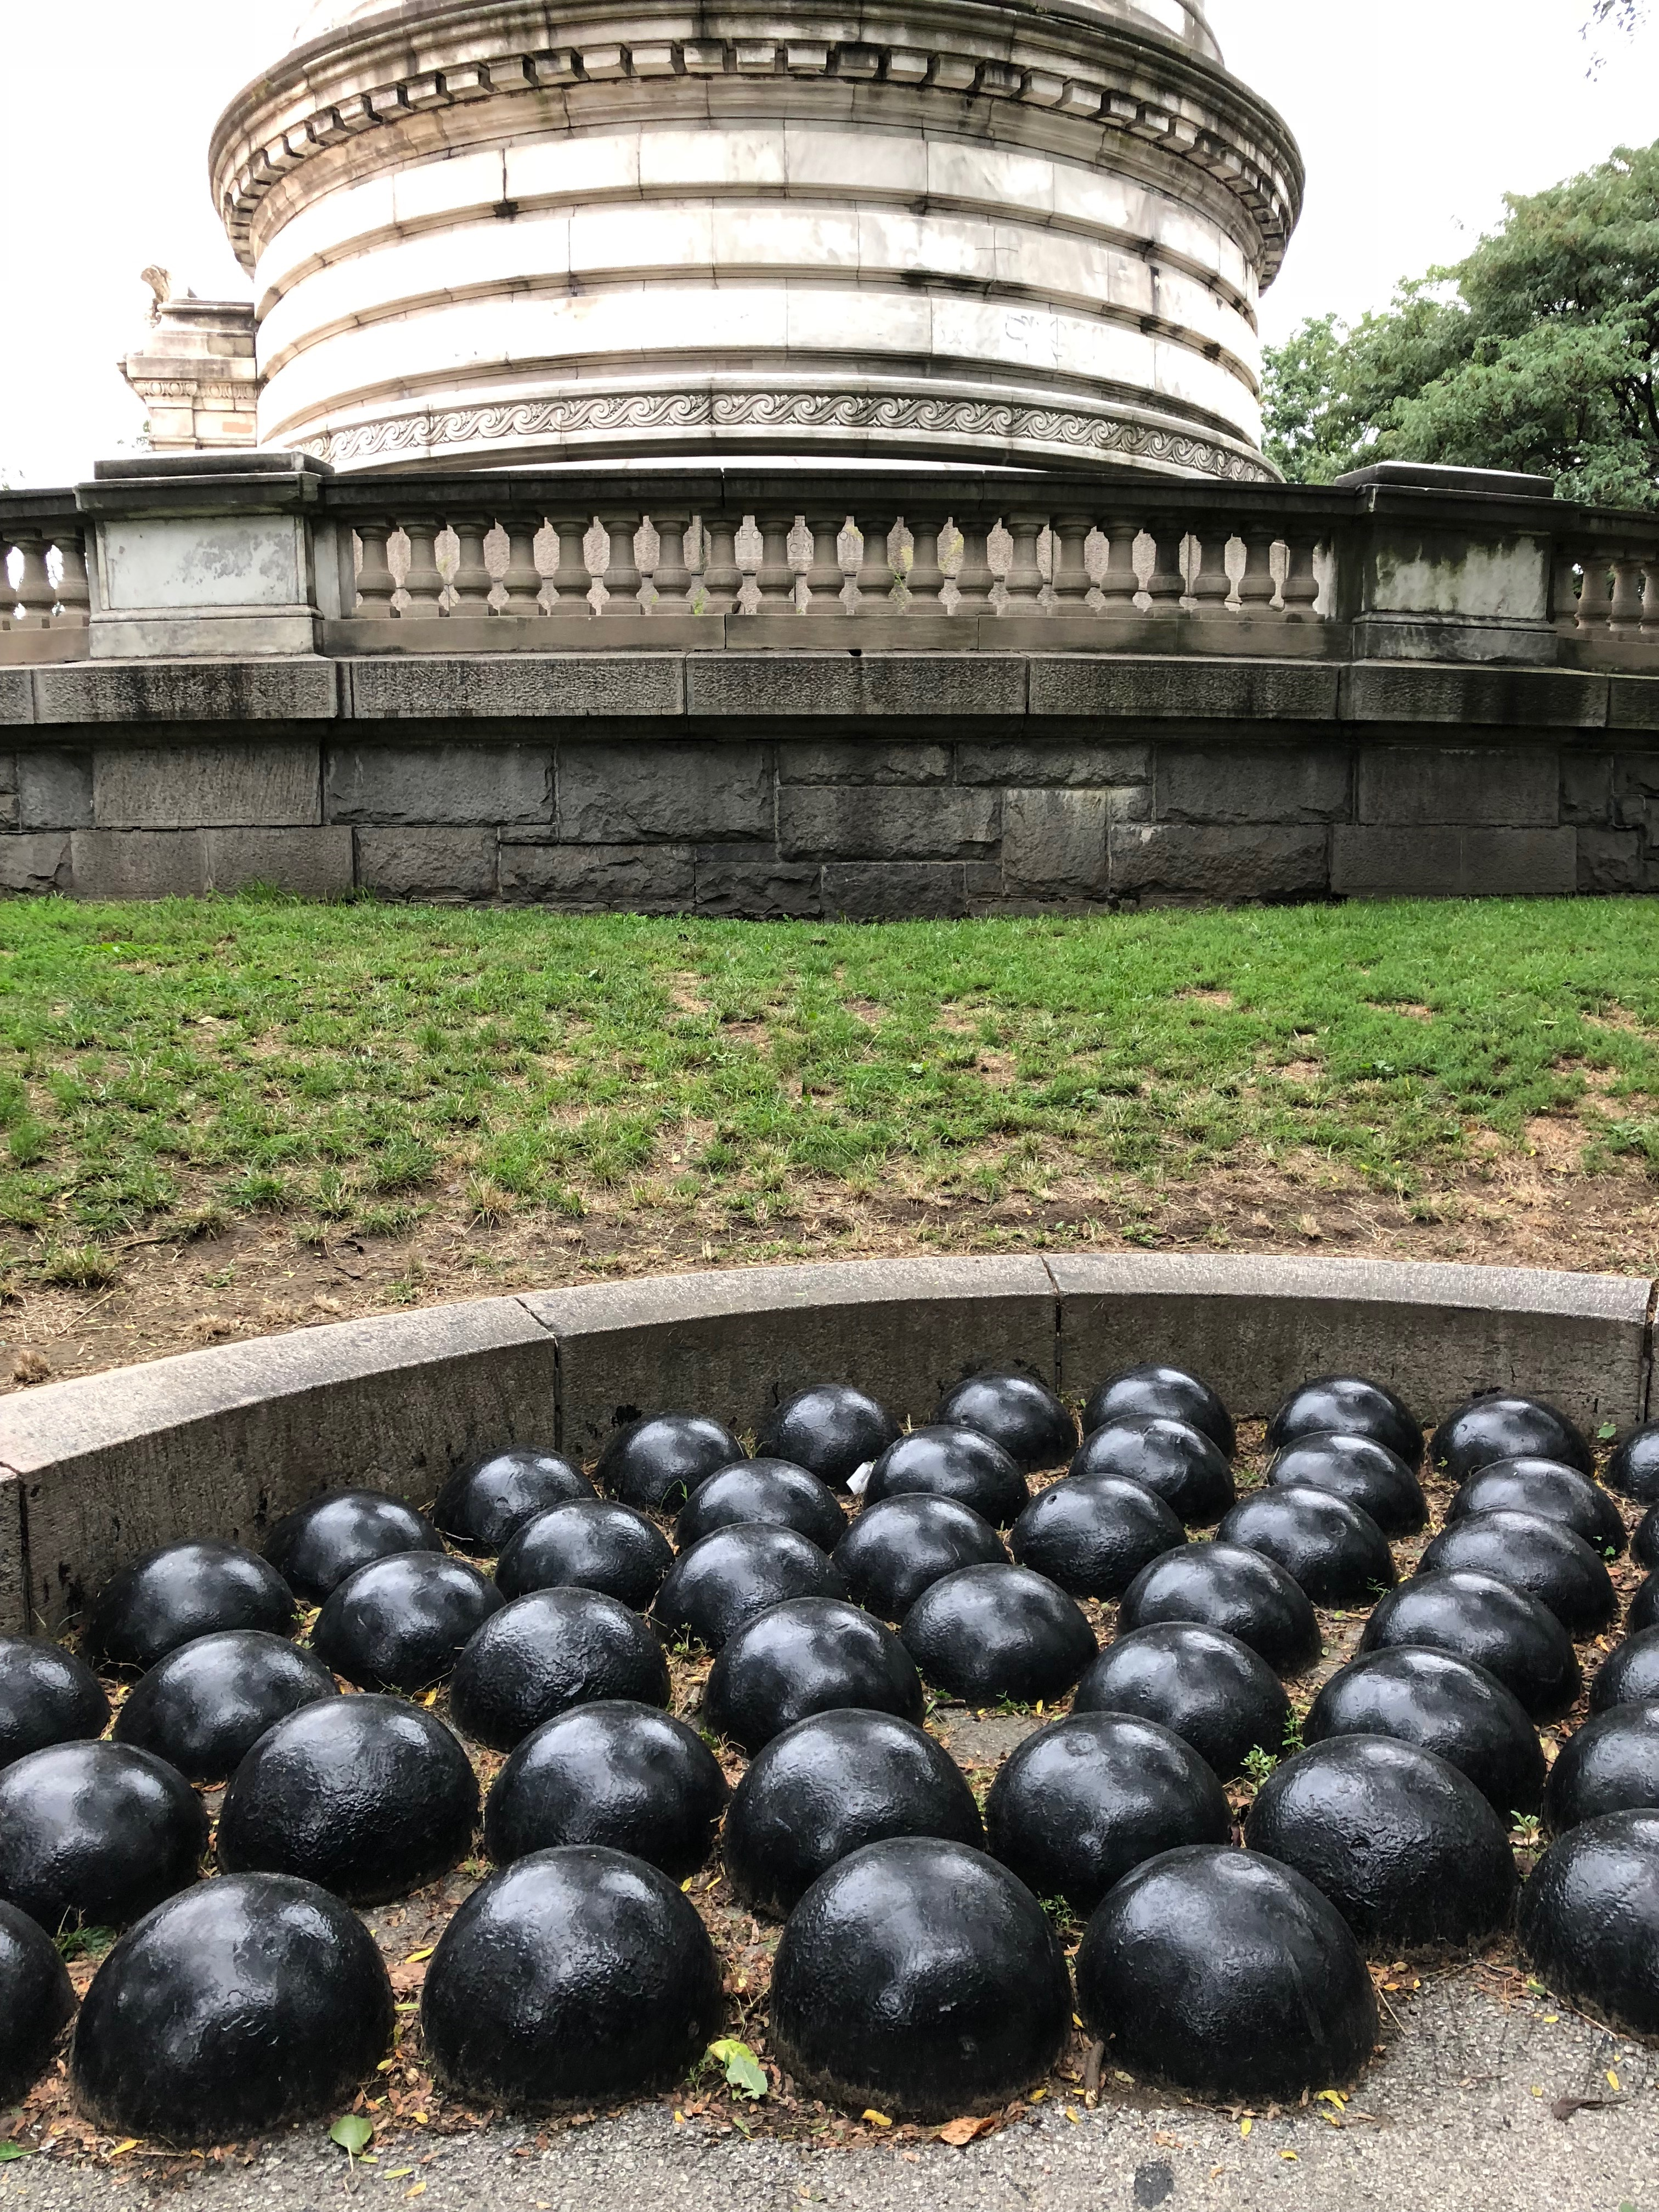 092018-Civil-War-cannon-balls-NYC